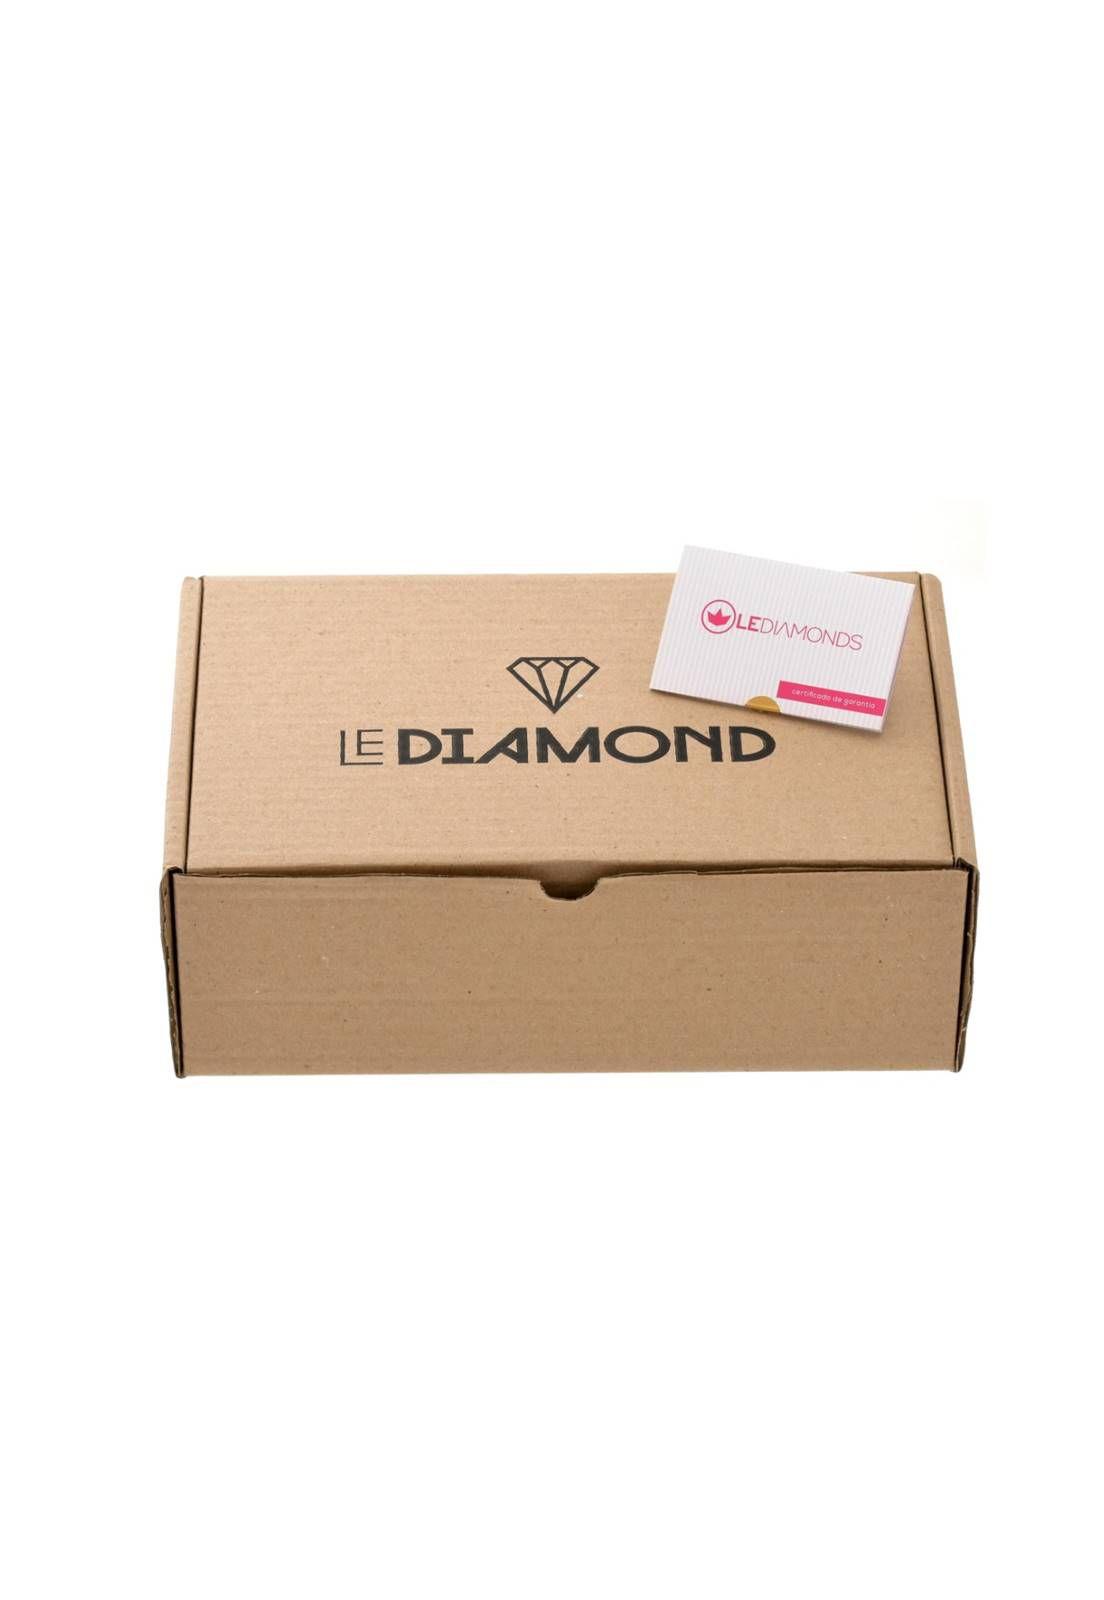 Brinco Le Diamond Concha Natural com Fios de Seda Rosa